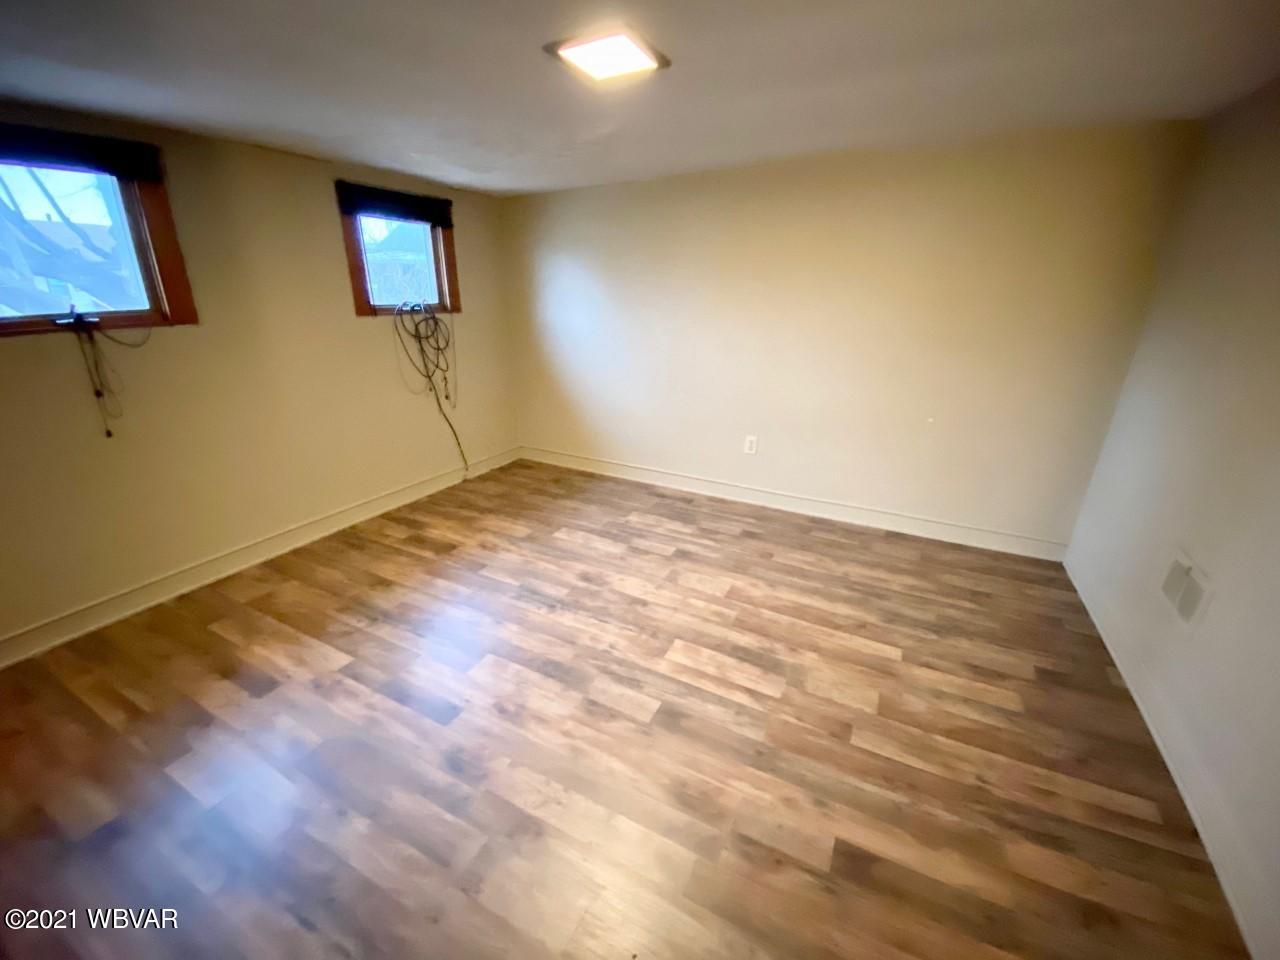 301 CATHERINE STREET, Williamsport, PA 17701, 3 Bedrooms Bedrooms, ,1.5 BathroomsBathrooms,Residential,For sale,CATHERINE,WB-91738